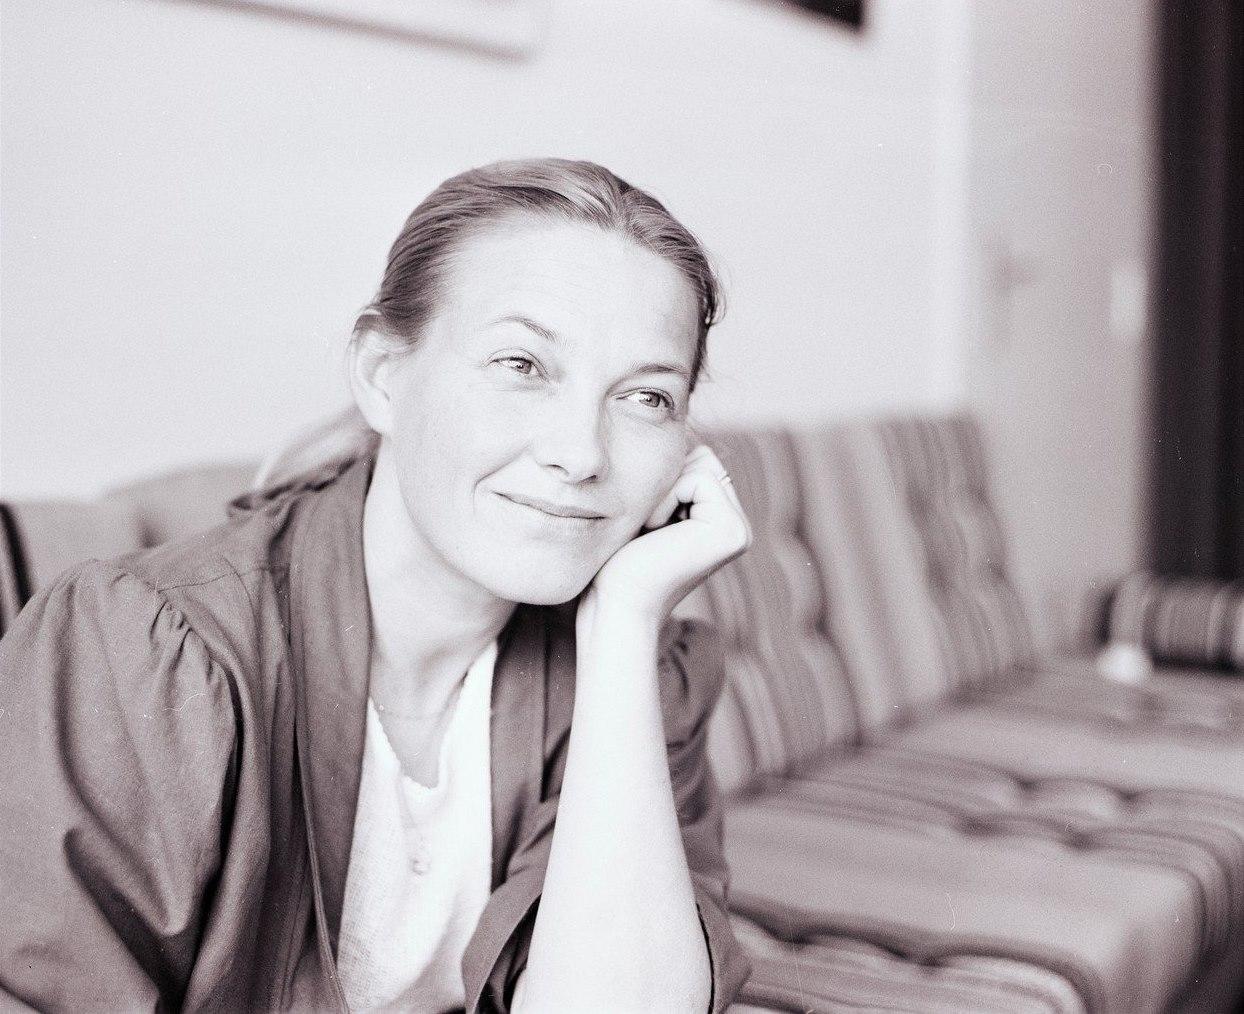 Cynthia Cleese (born 1971),Lizan Mitchell XXX pics & movies Miriam Chytilova,Teresa Mannino